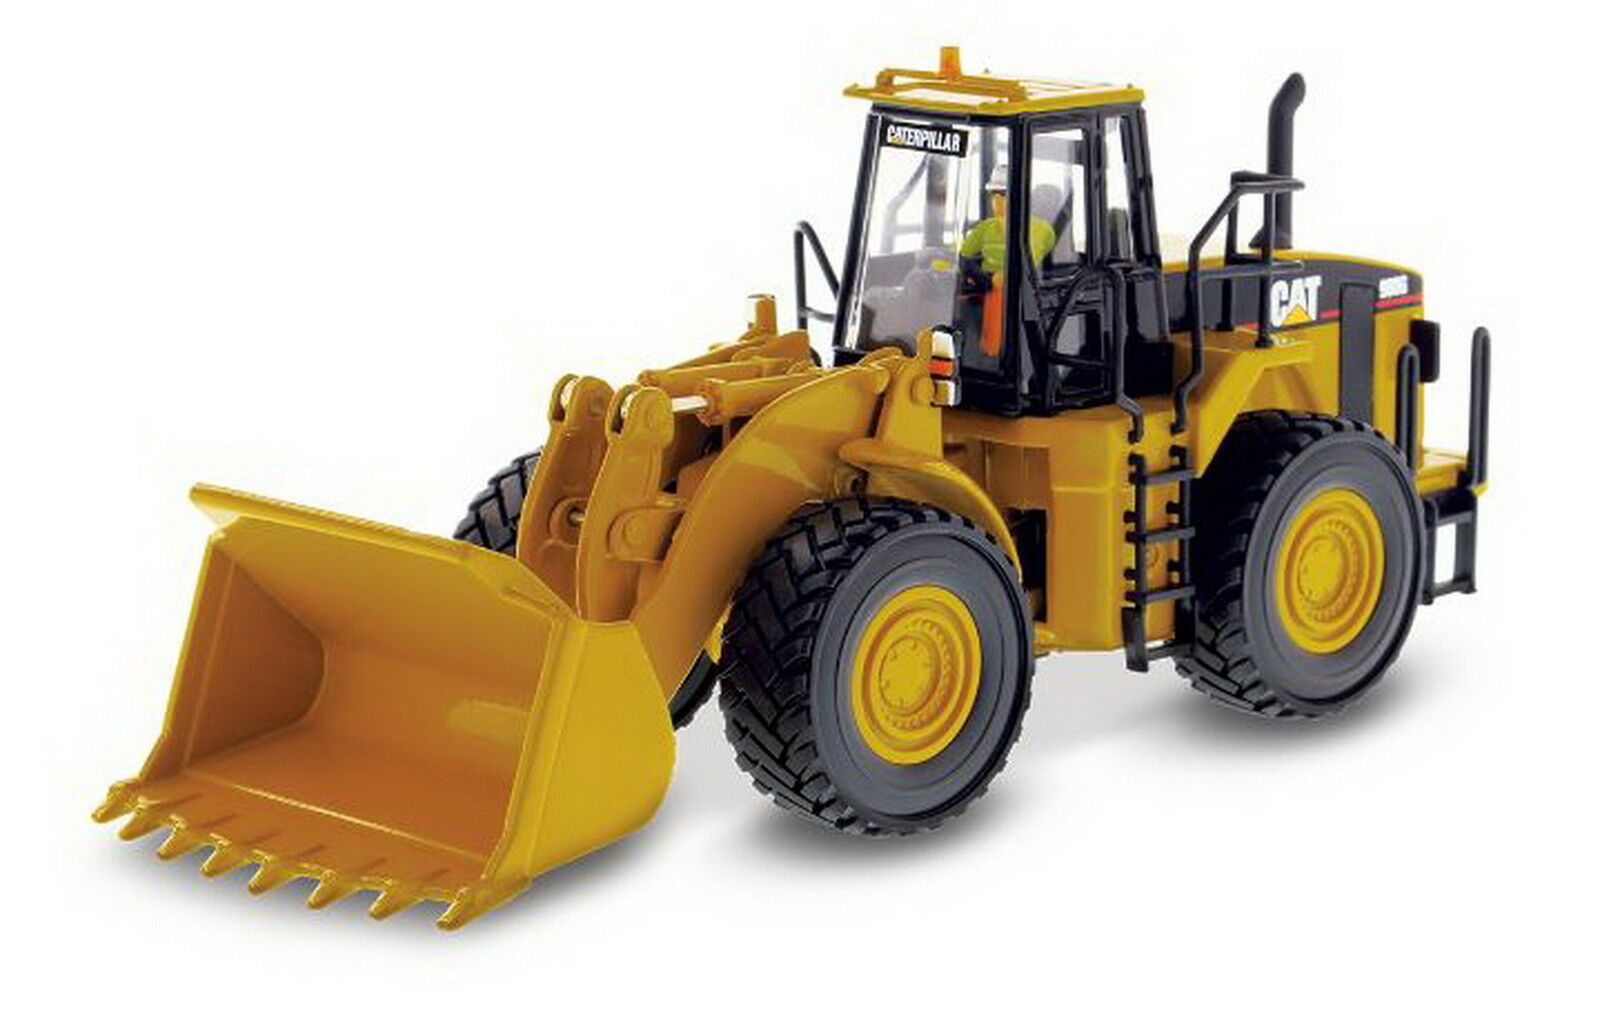 1 50 DM Caterpillar Cat 980G Wheel Loader Diecast Models